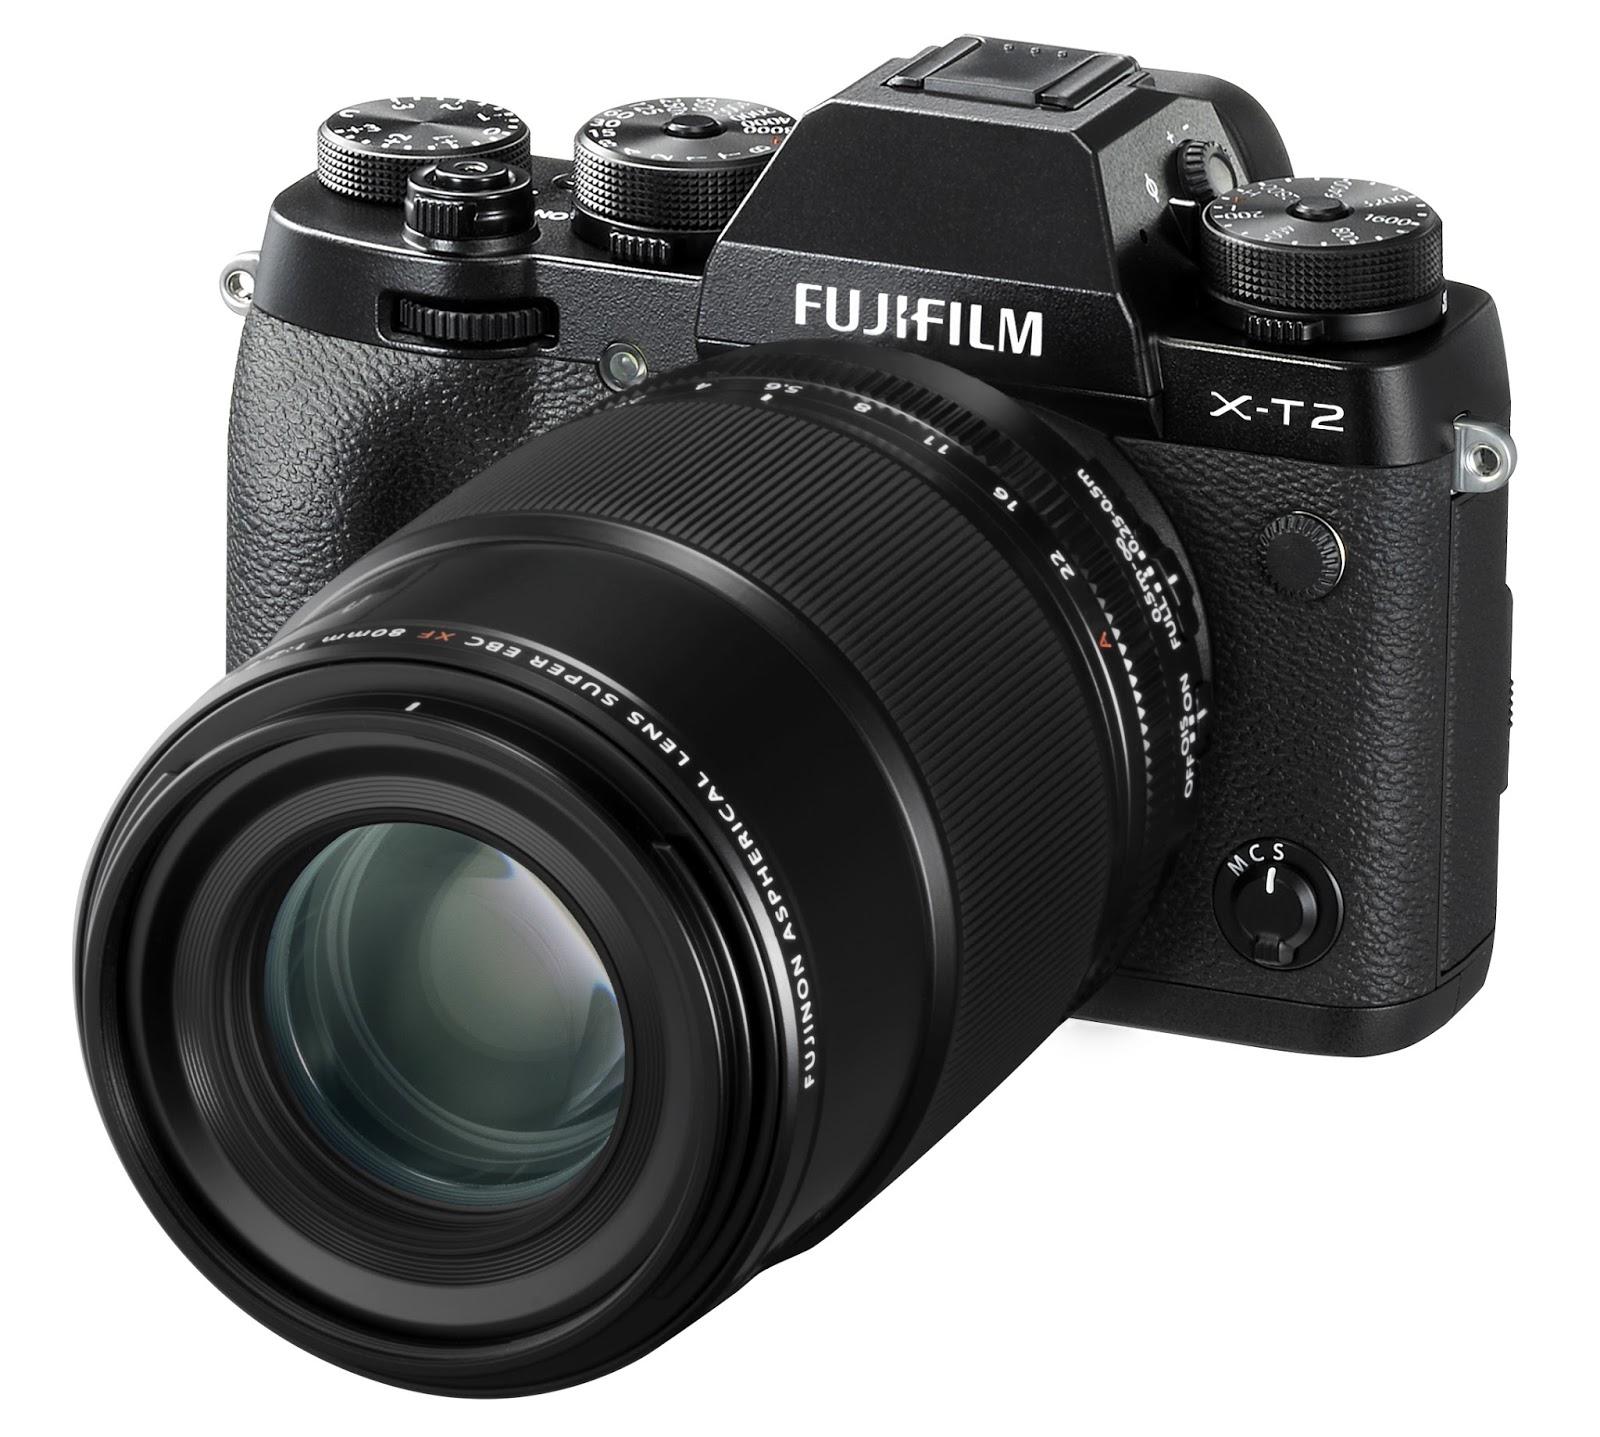 Fujifilm X-T2 и Fujinon XF 80mm f/2.8 LM OIS WR Macro